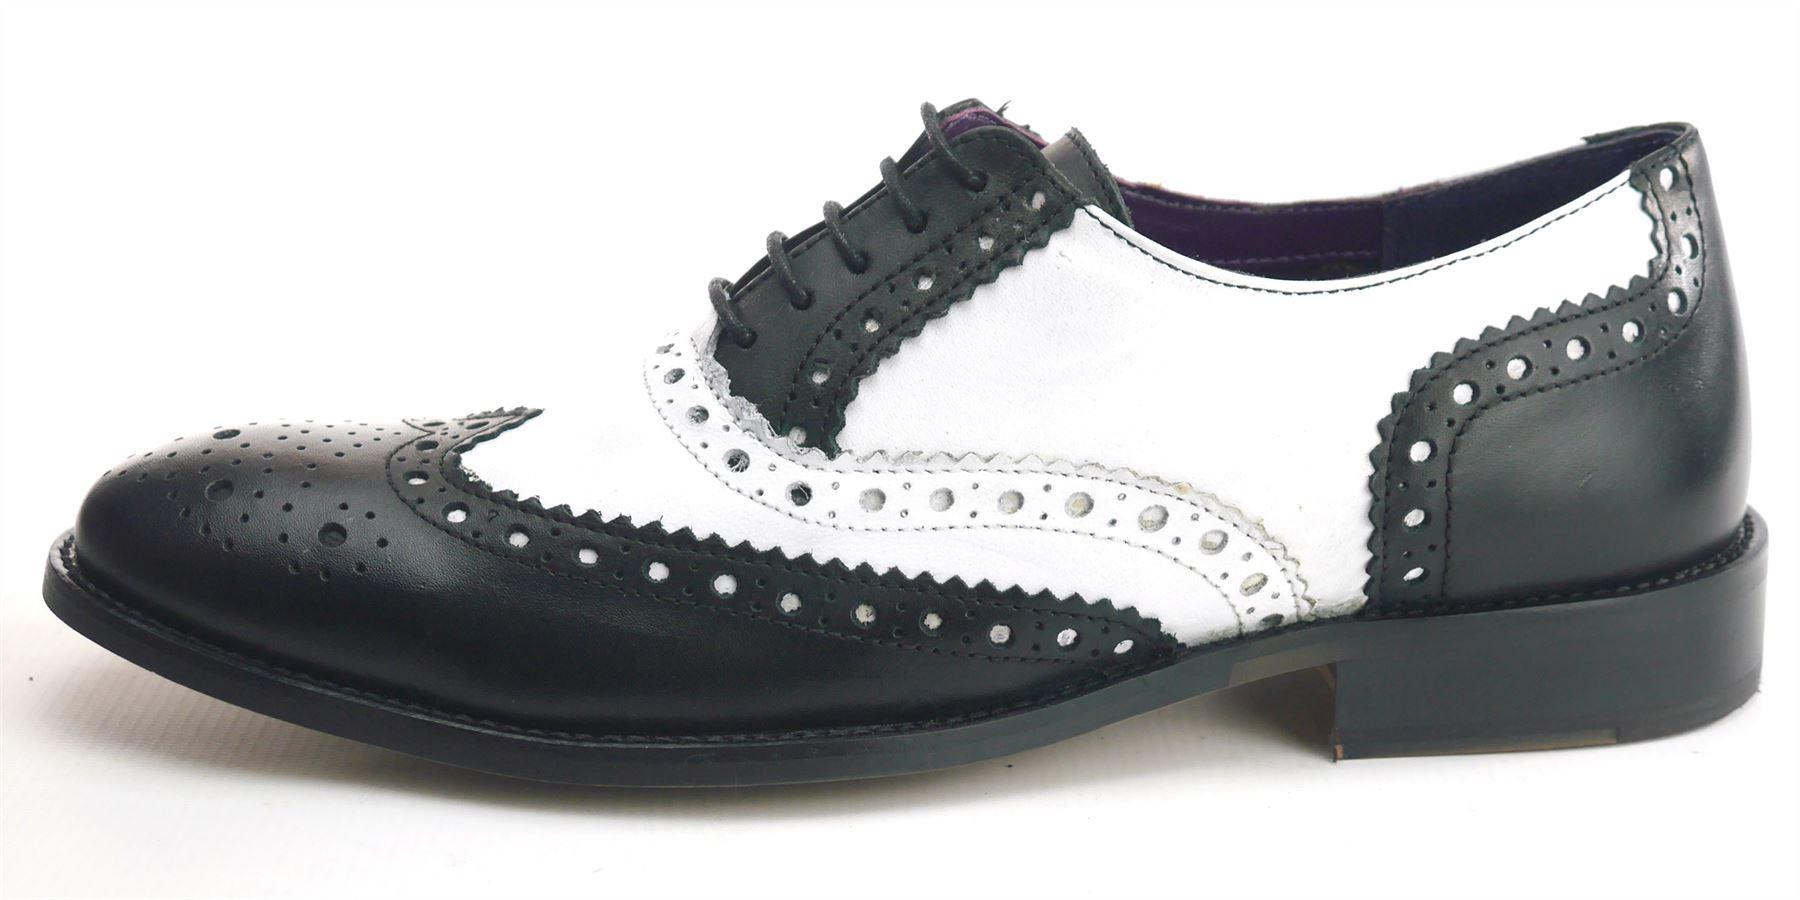 Frank James ROTford ROTford ROTford Leder Wedding Lace Up Fashion Brogues   Herren Schuhes 06b7f5